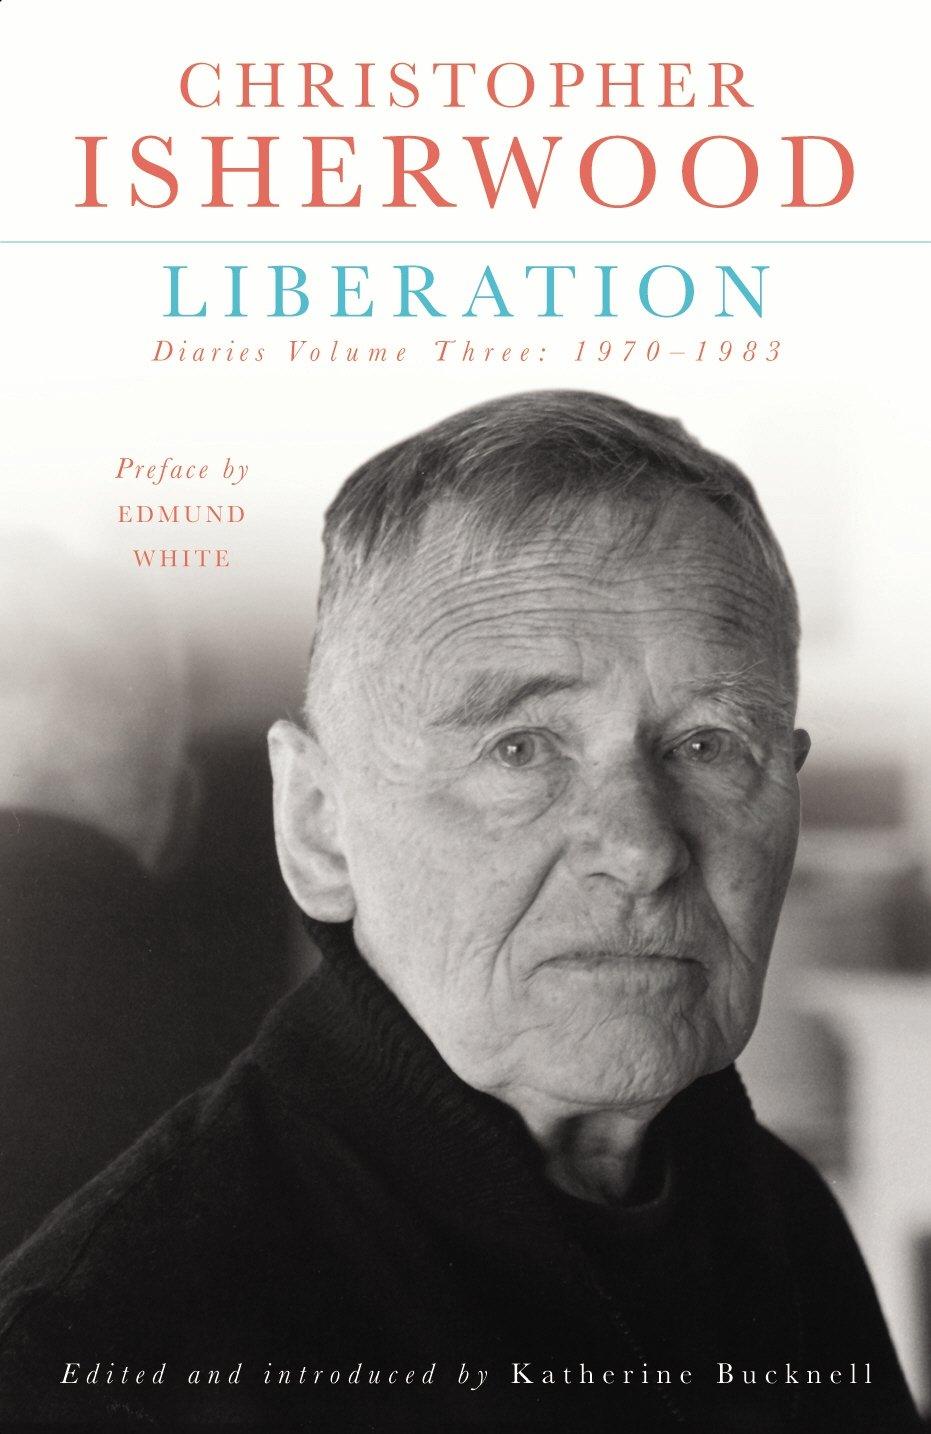 Liberation: Diaries Vol 3: Amazon.co.uk: Christopher Isherwood, Katherine  Bucknell: 9780701184490: Books